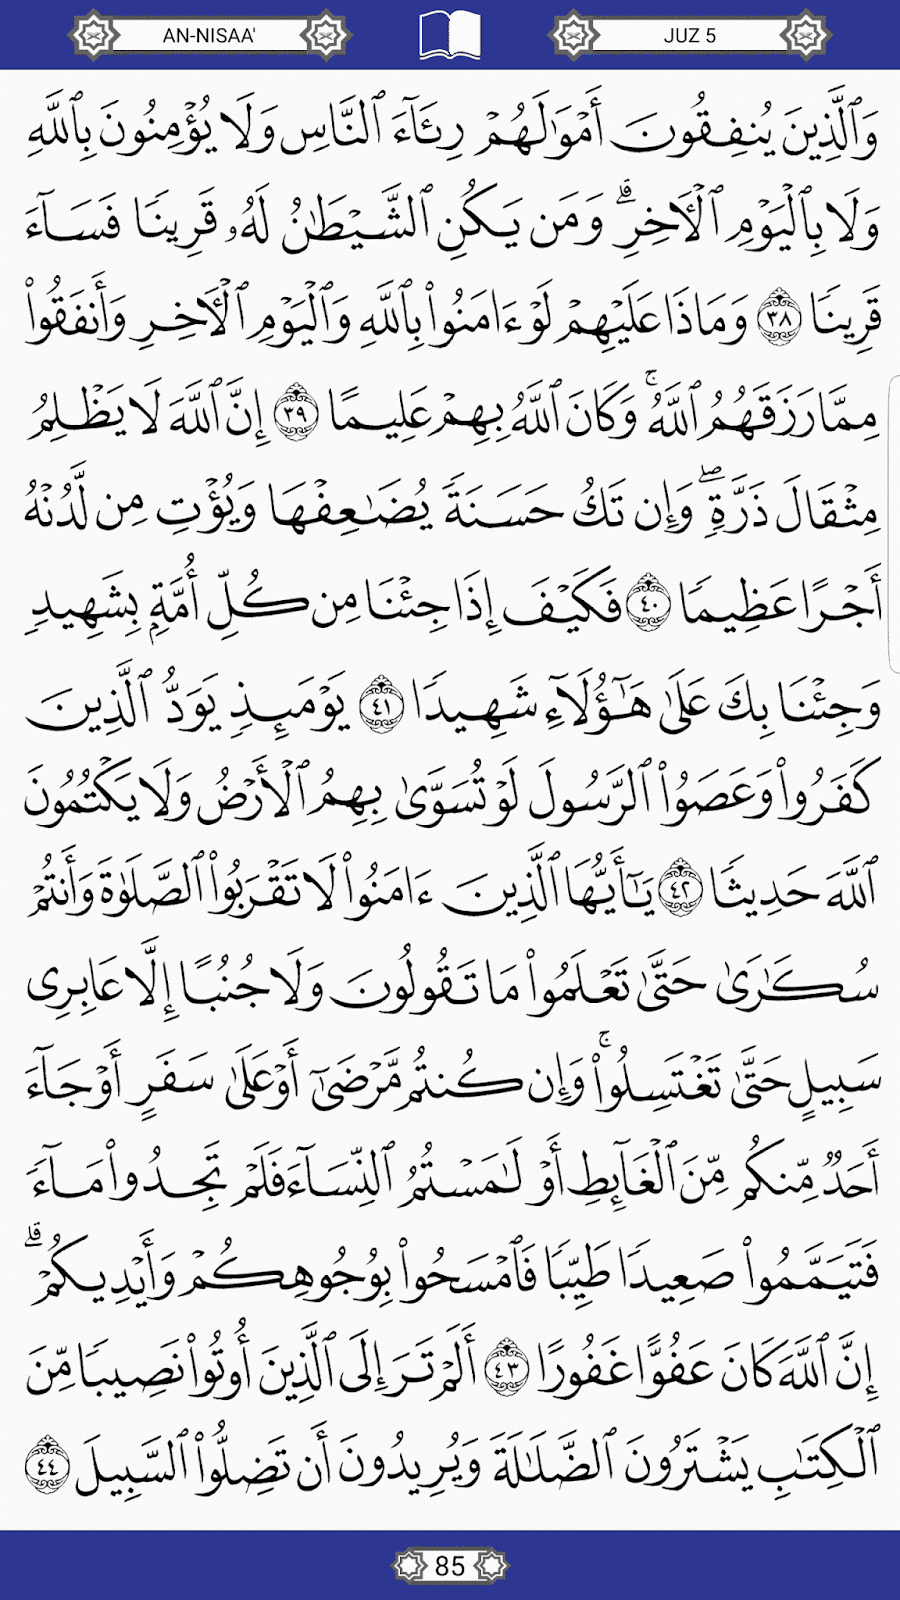 Annisa ayat 1